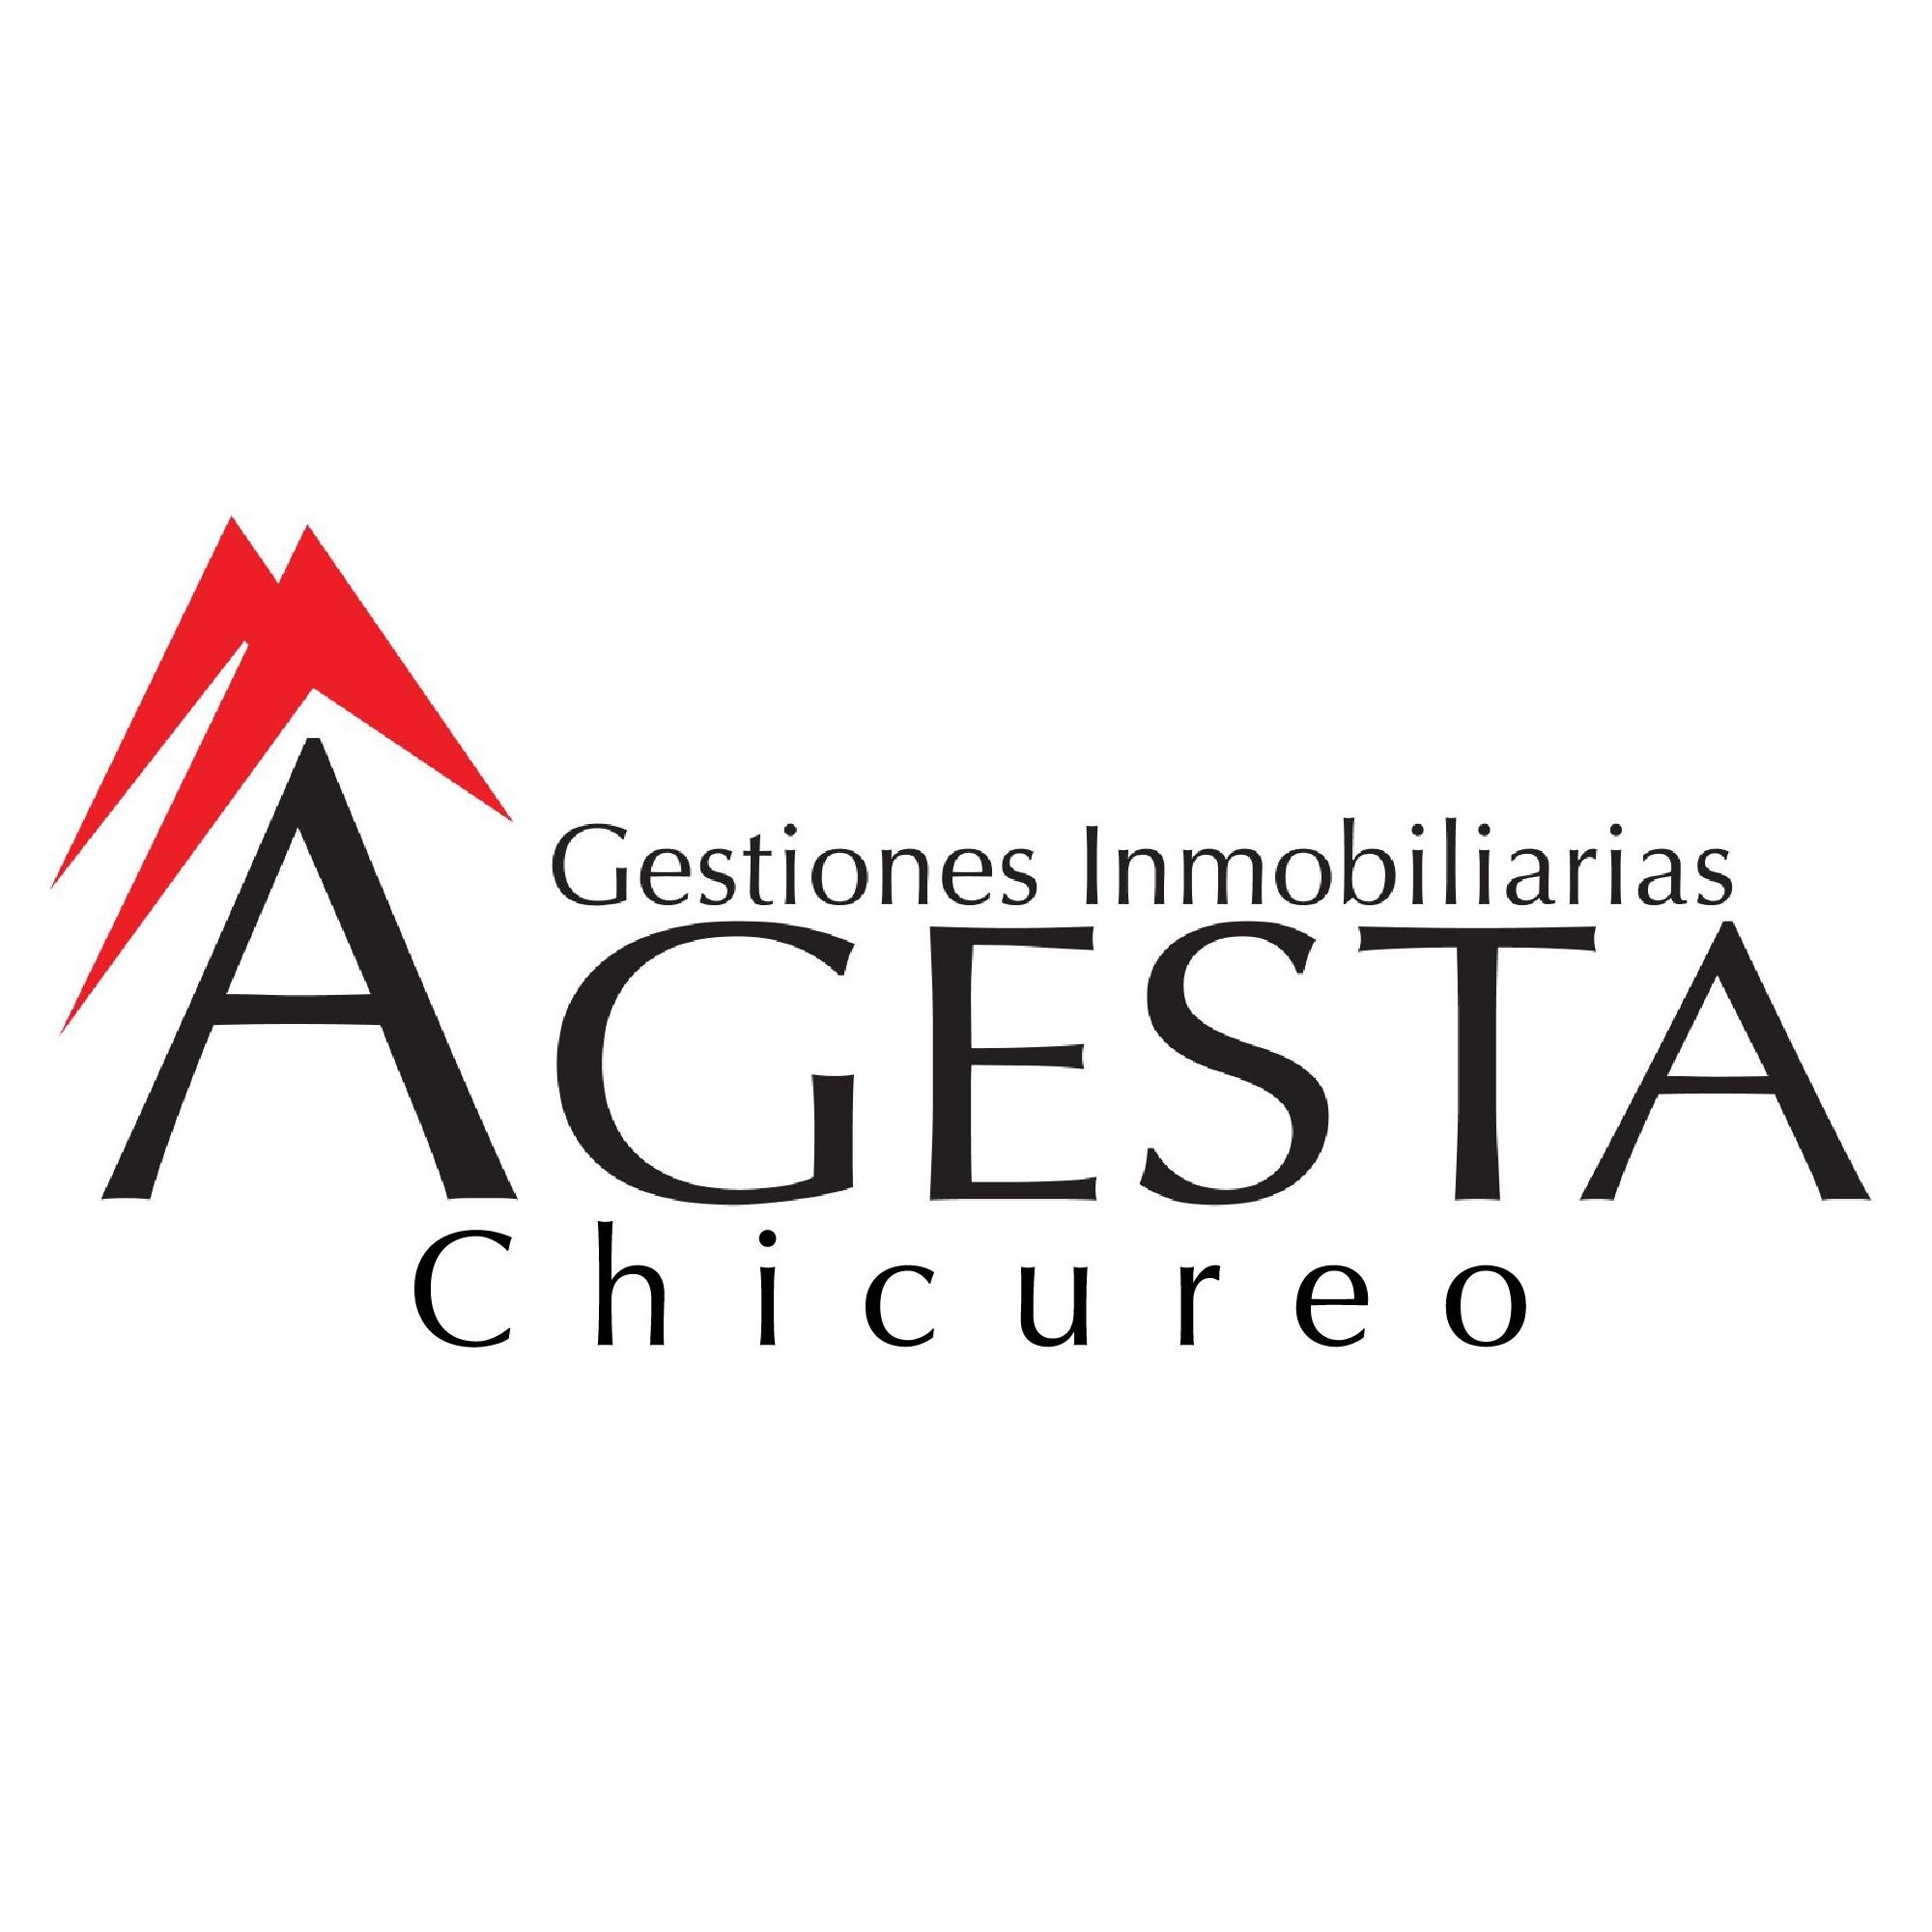 AGESTA CHICUREO